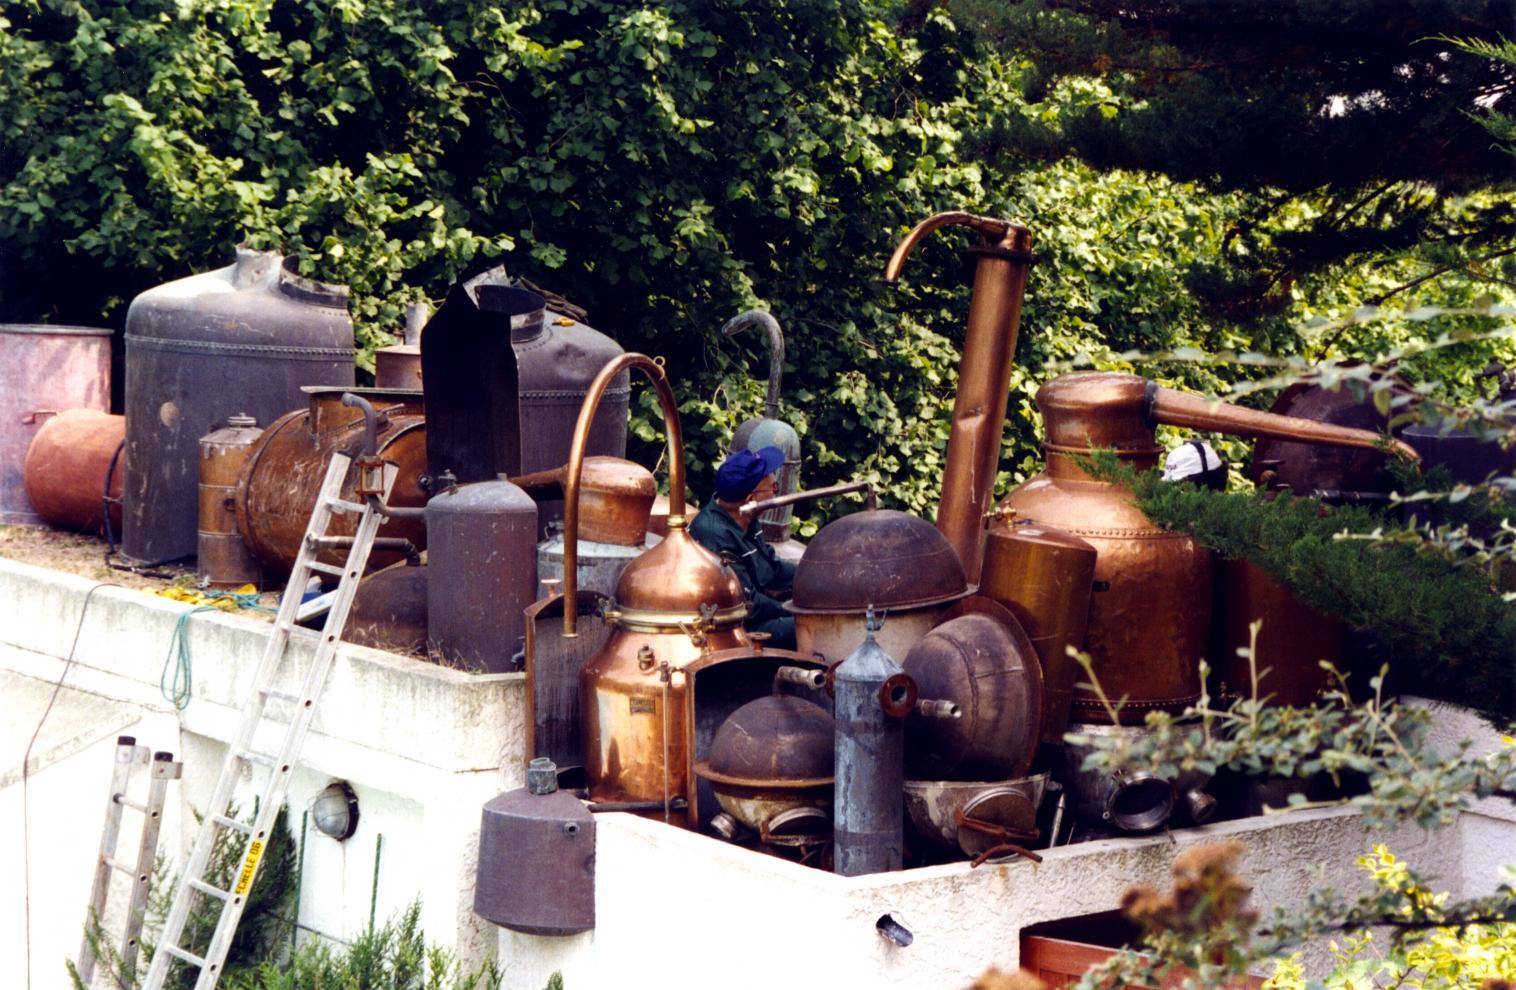 Homage to hieronymus bosch mus e arman for Bosch jardin des delices